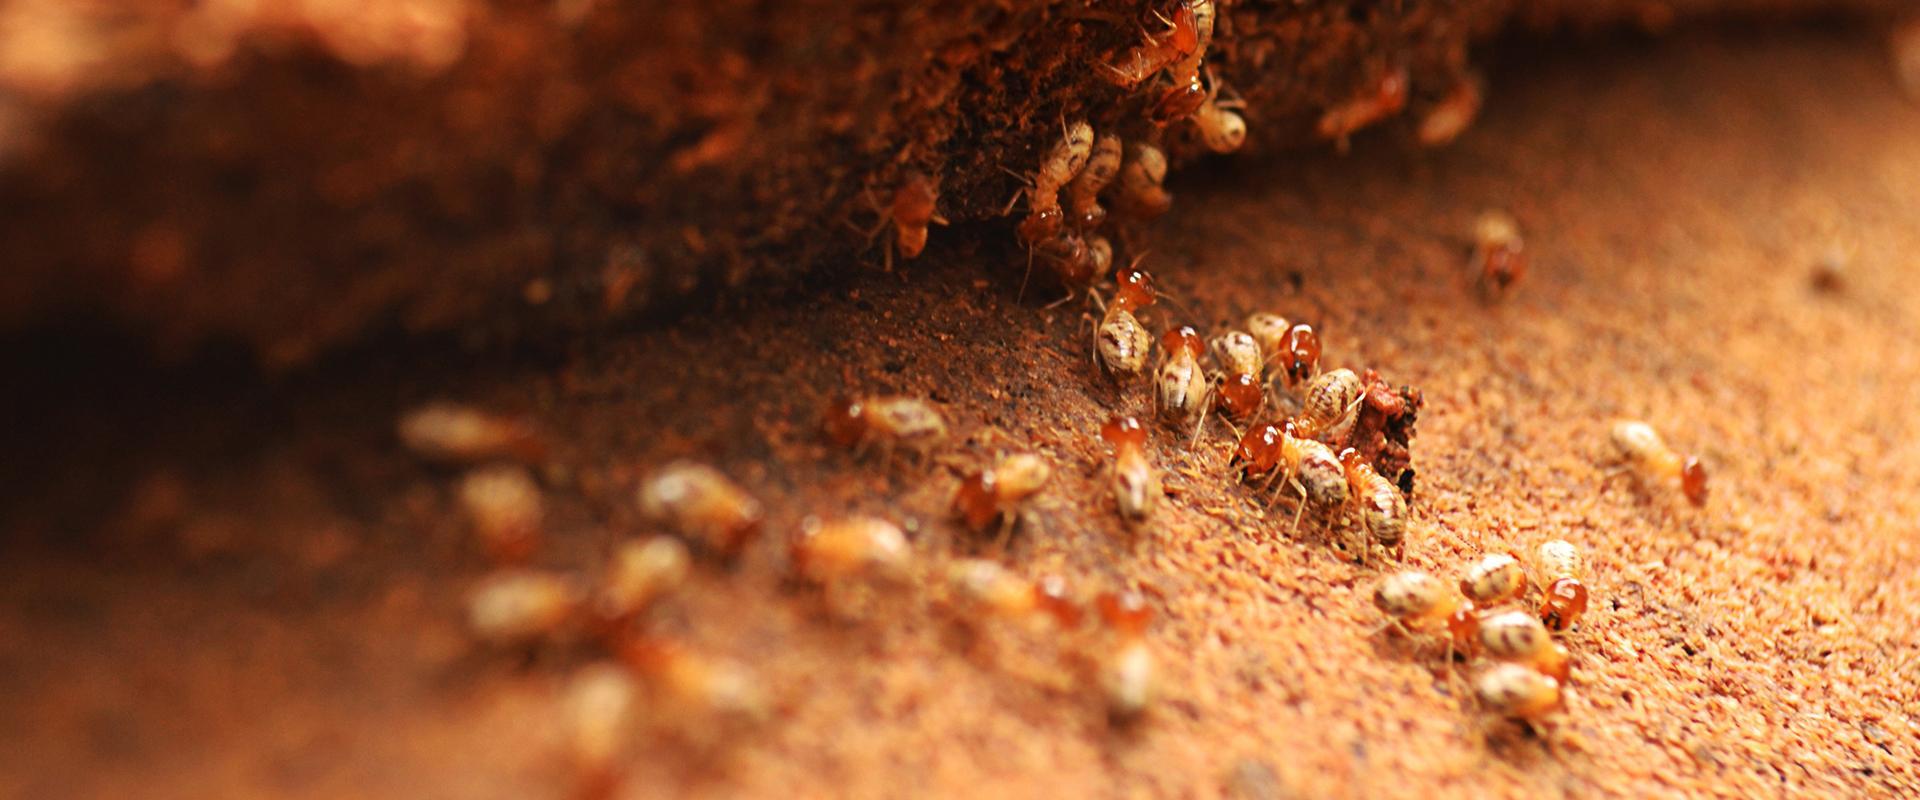 termites on dirt